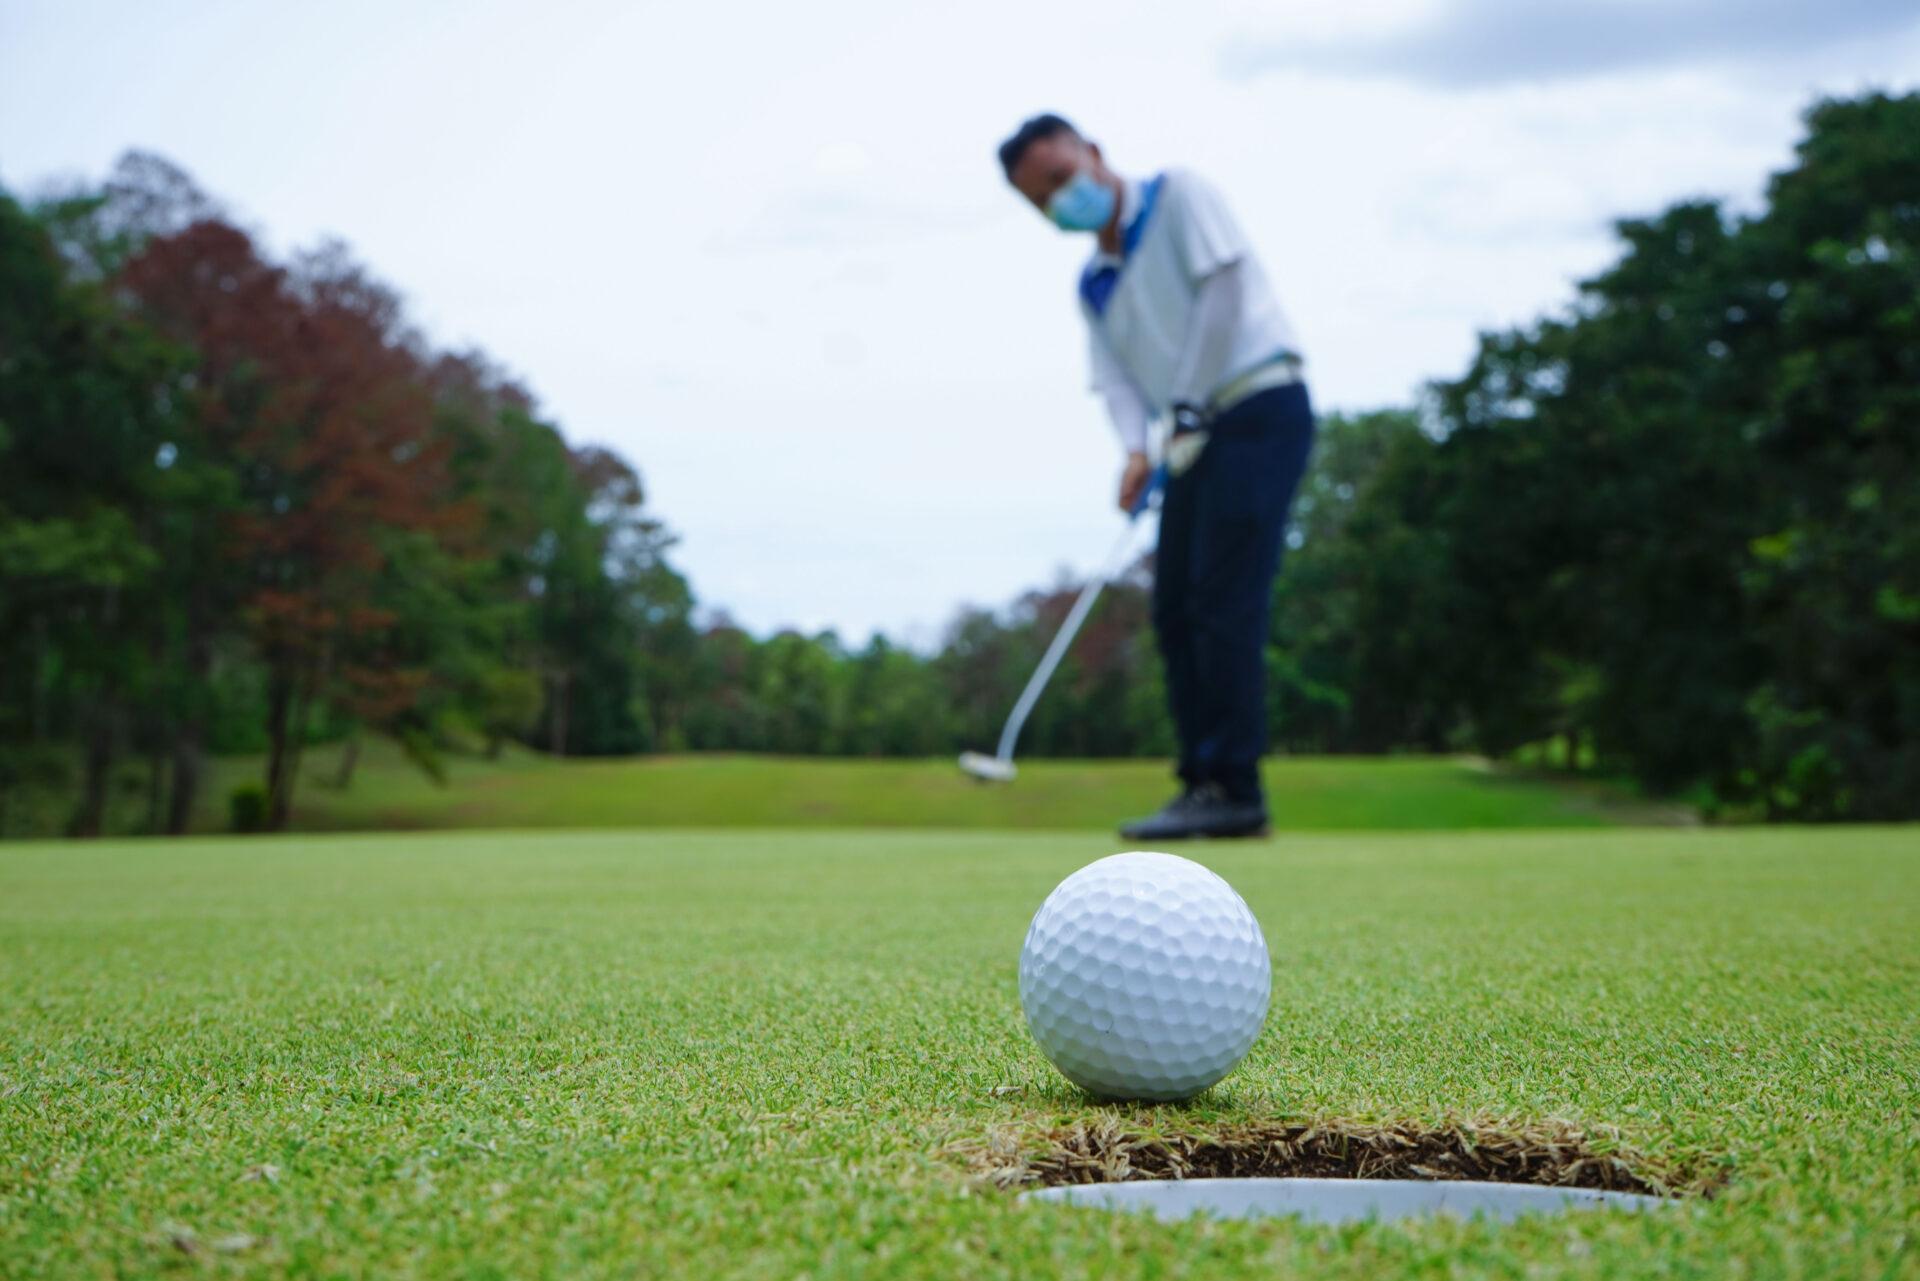 Golf Covid-19